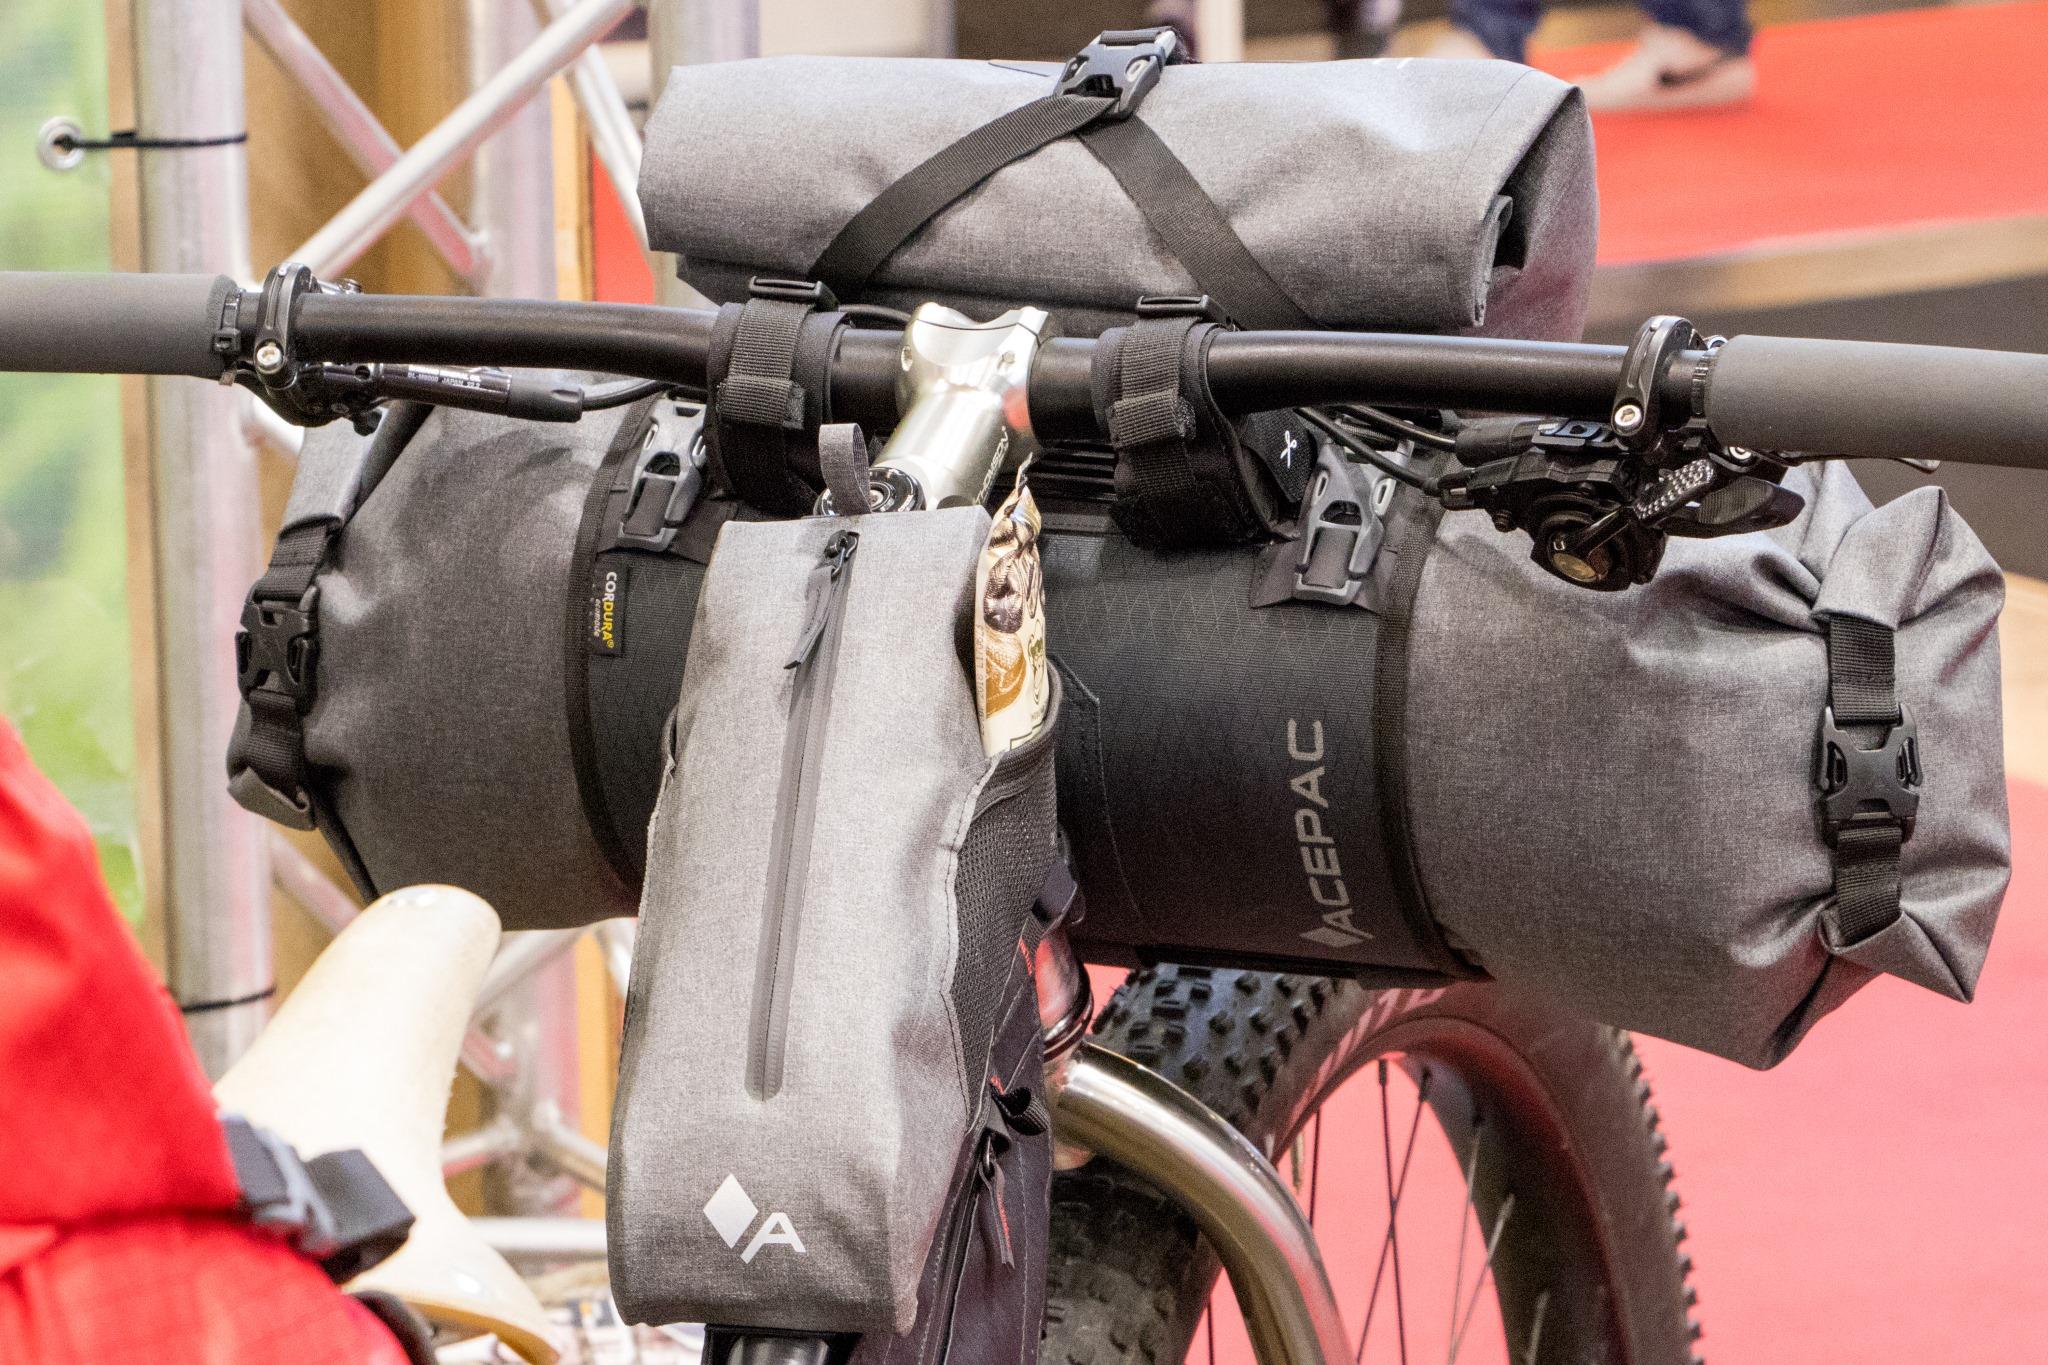 acepack_bikepacking006